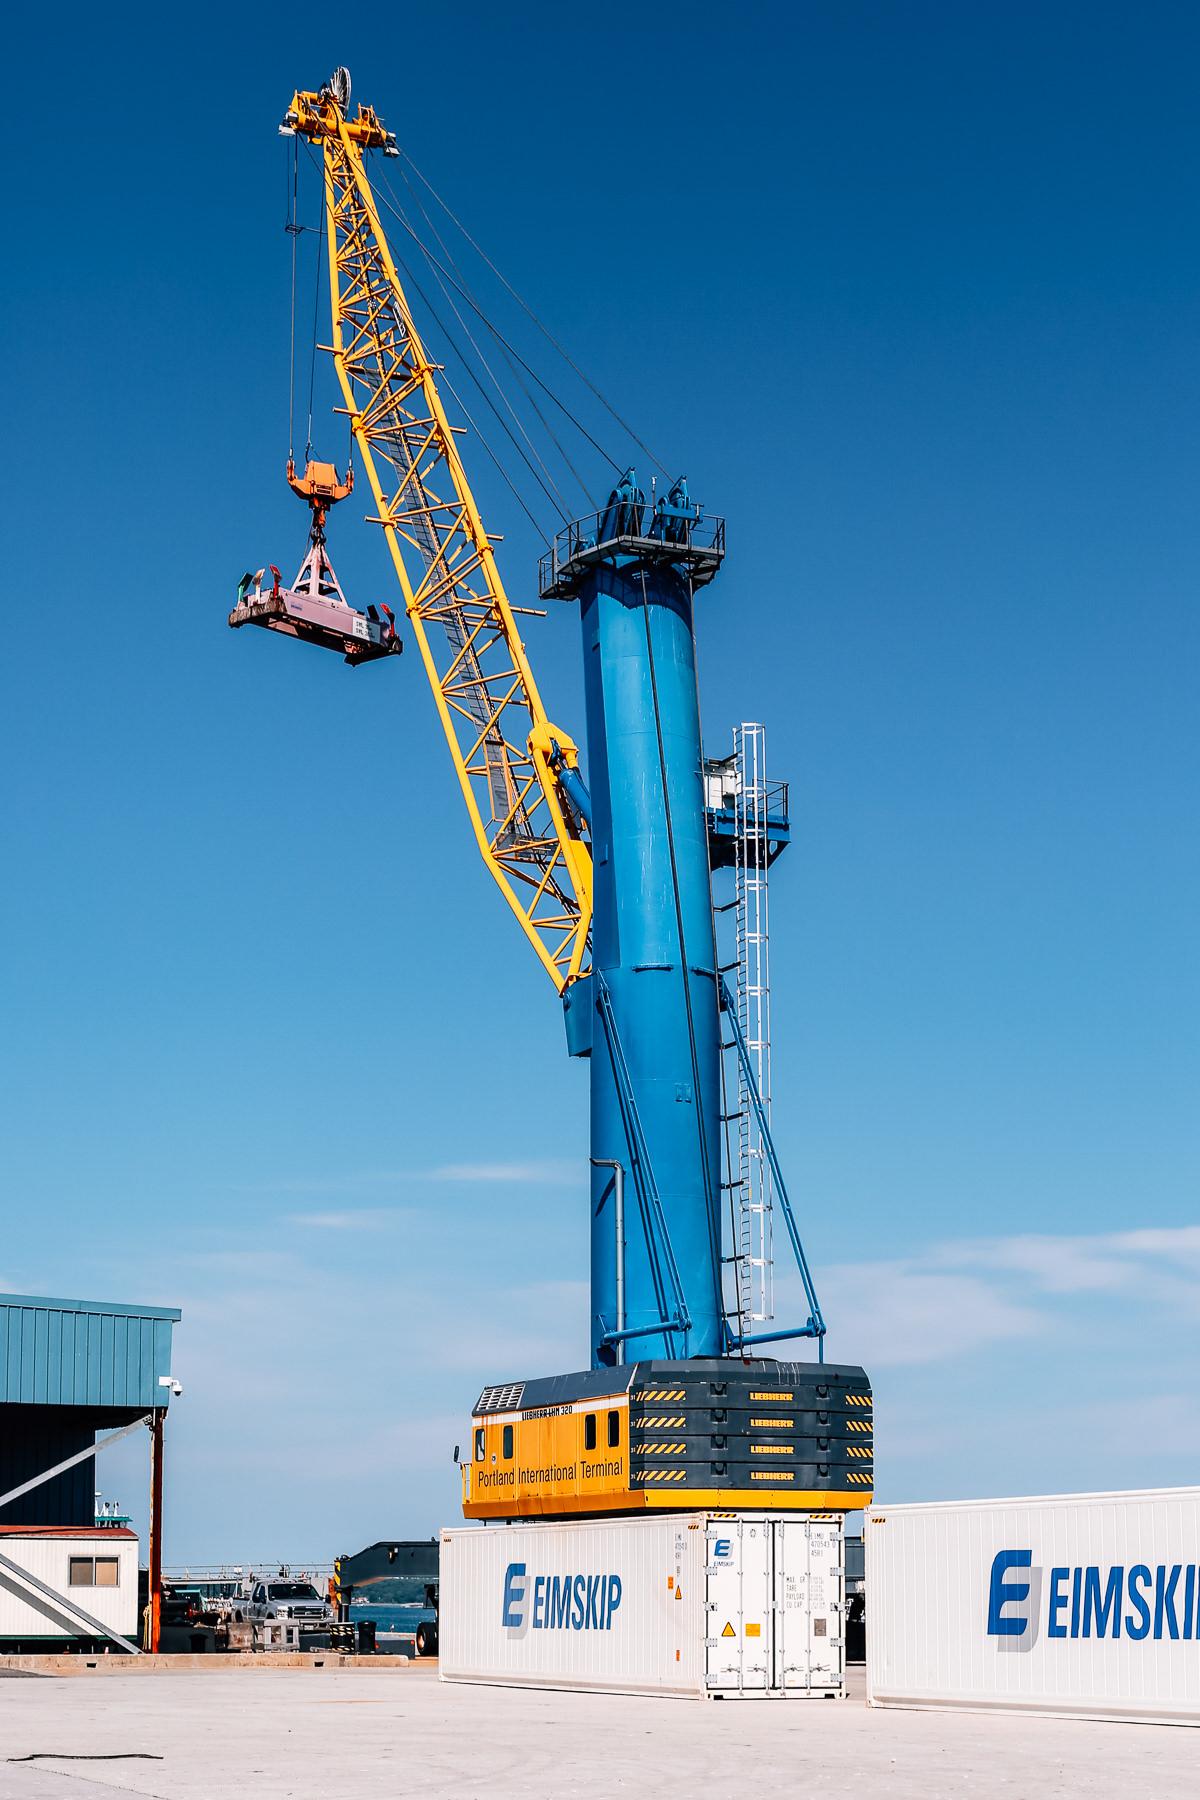 The Crane at the International Marine Terminal. Justin Levesque © 2016